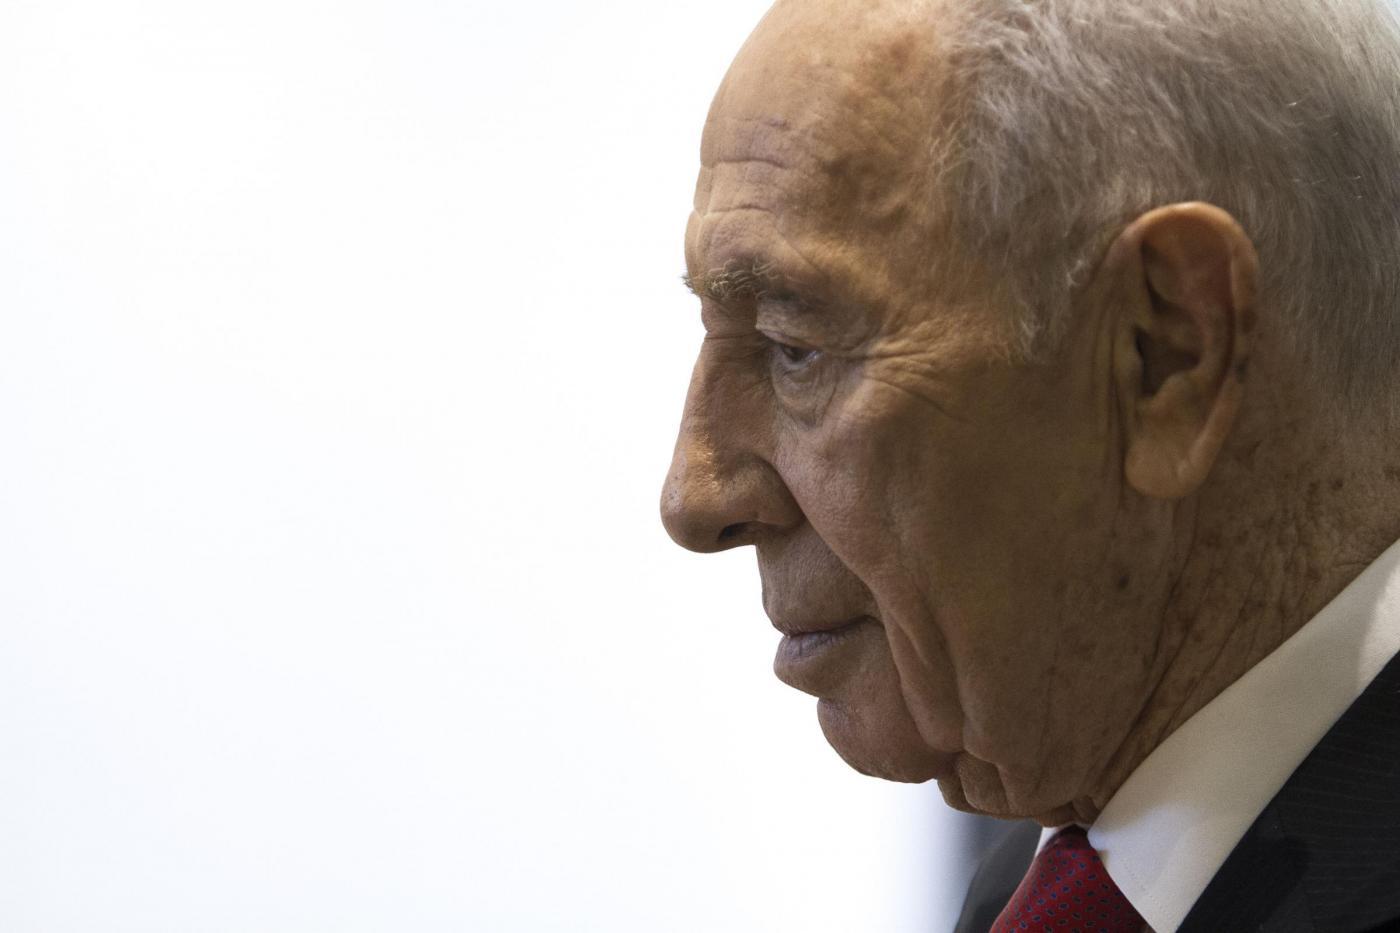 Morto Shimon Peres, lavorò per la pace tra Israele e Palestina